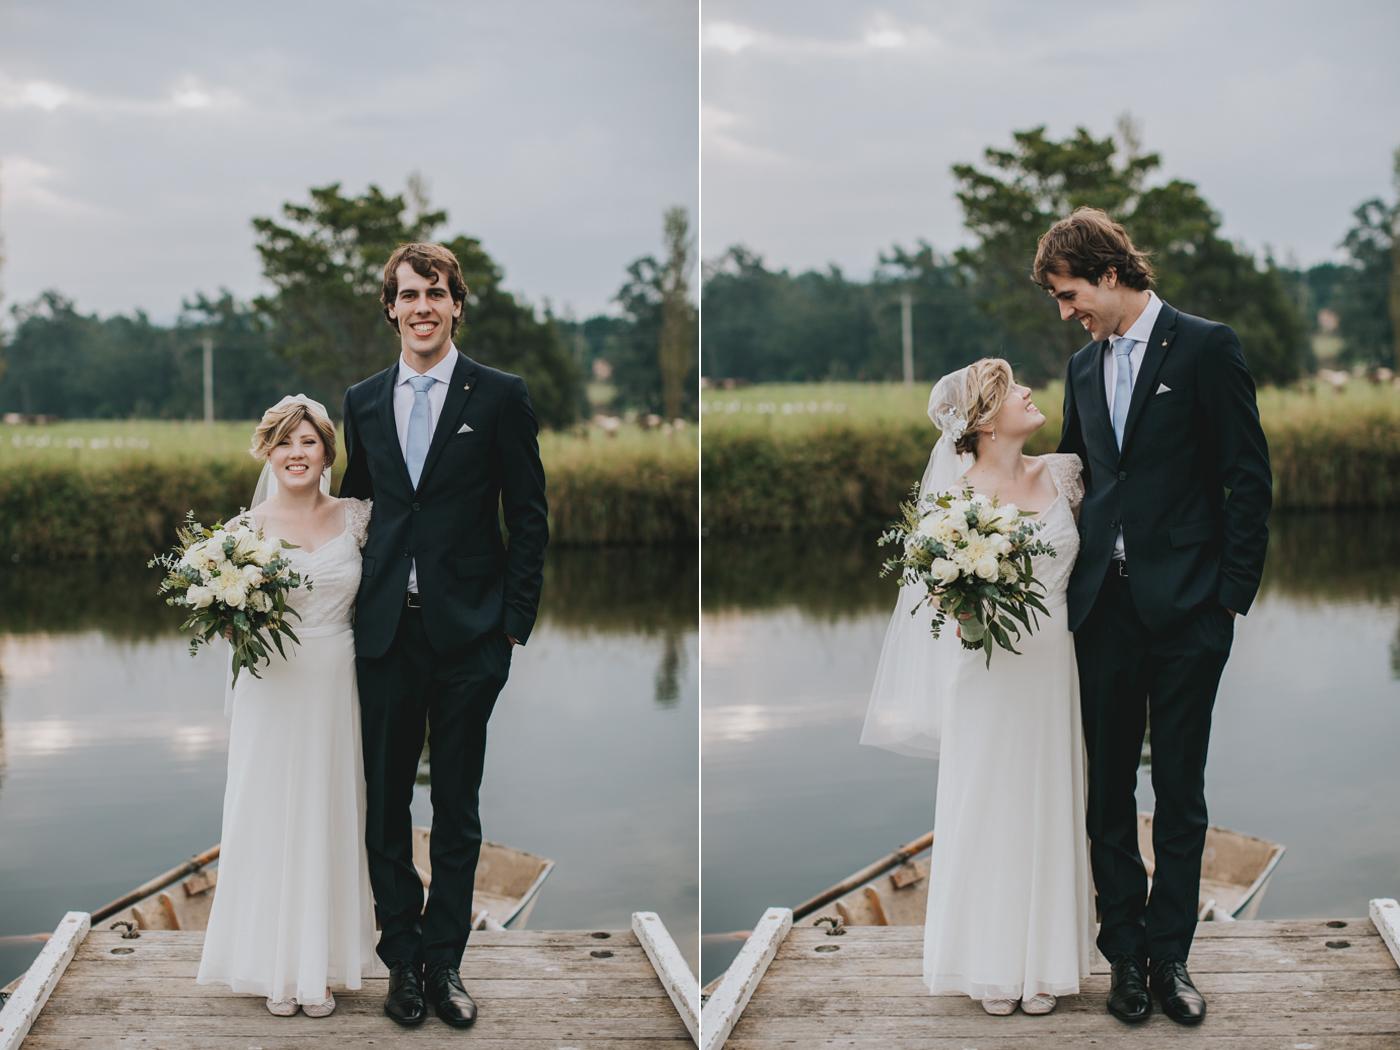 Rachel & Jacob - Willow Farm Berry - South Coast Wedding - Samantha Heather Photography-126.jpg